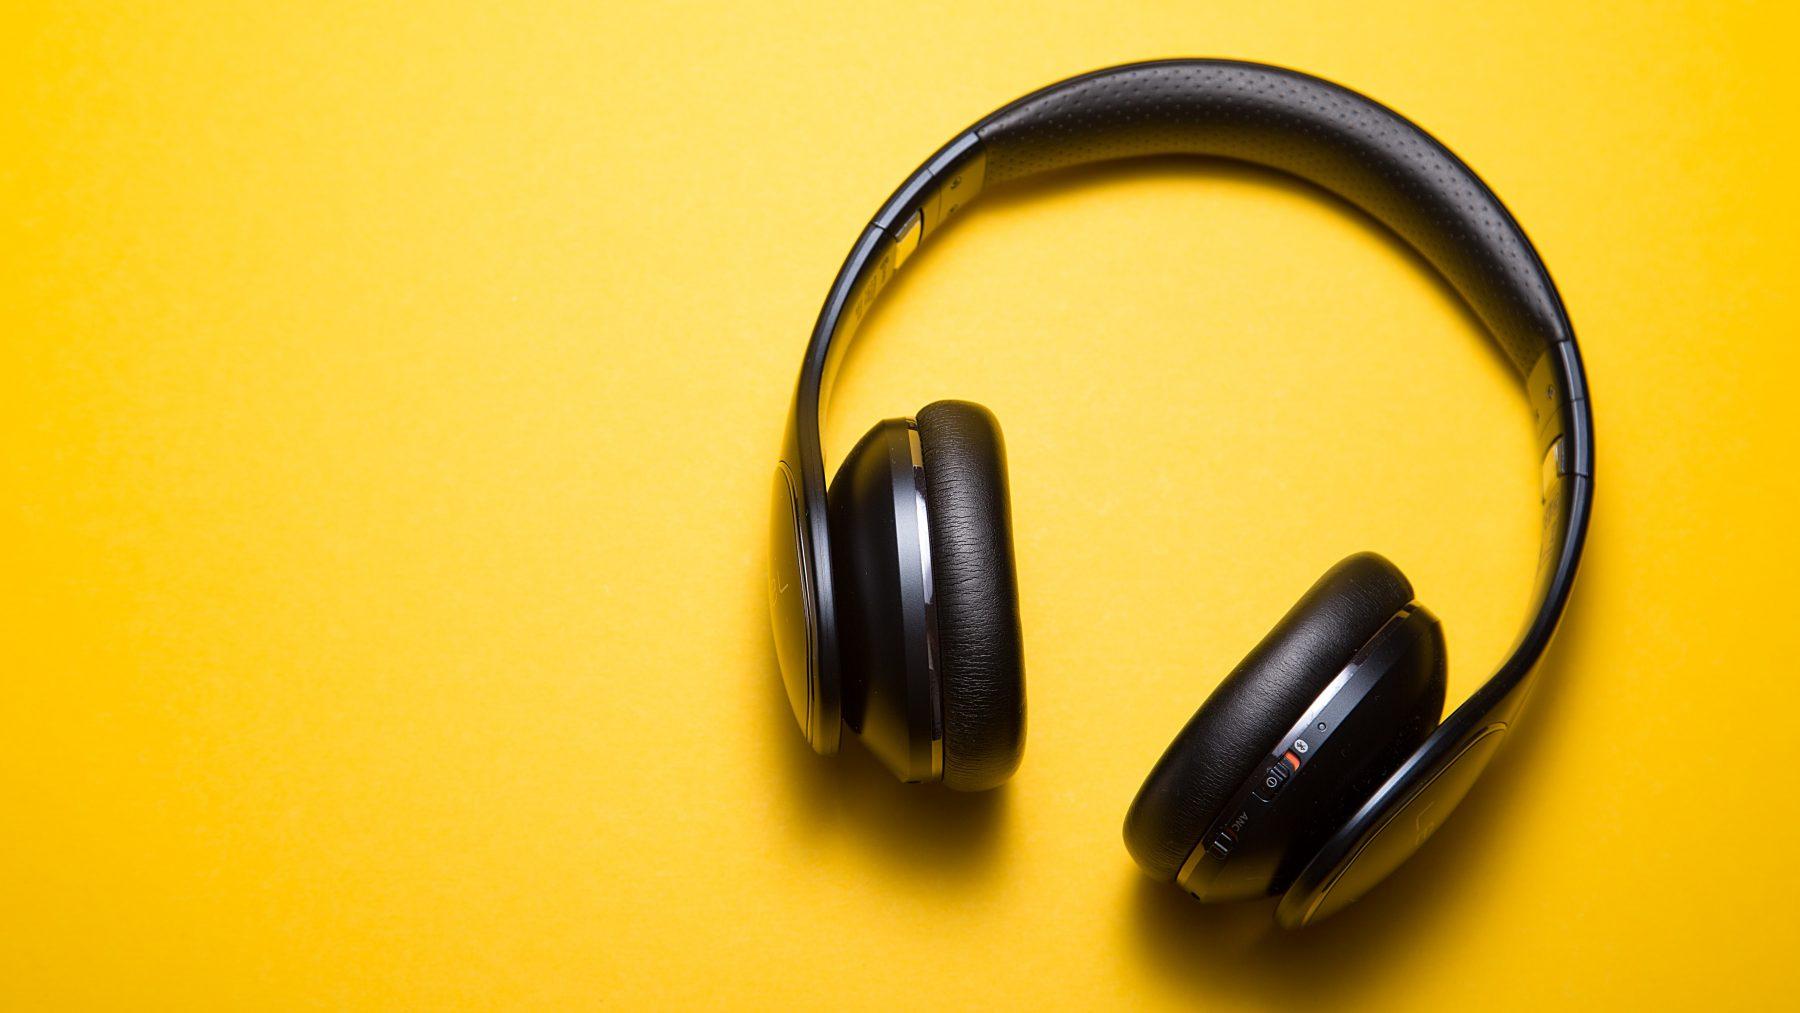 7x leuke podcasts om even je gedachten te verzetten